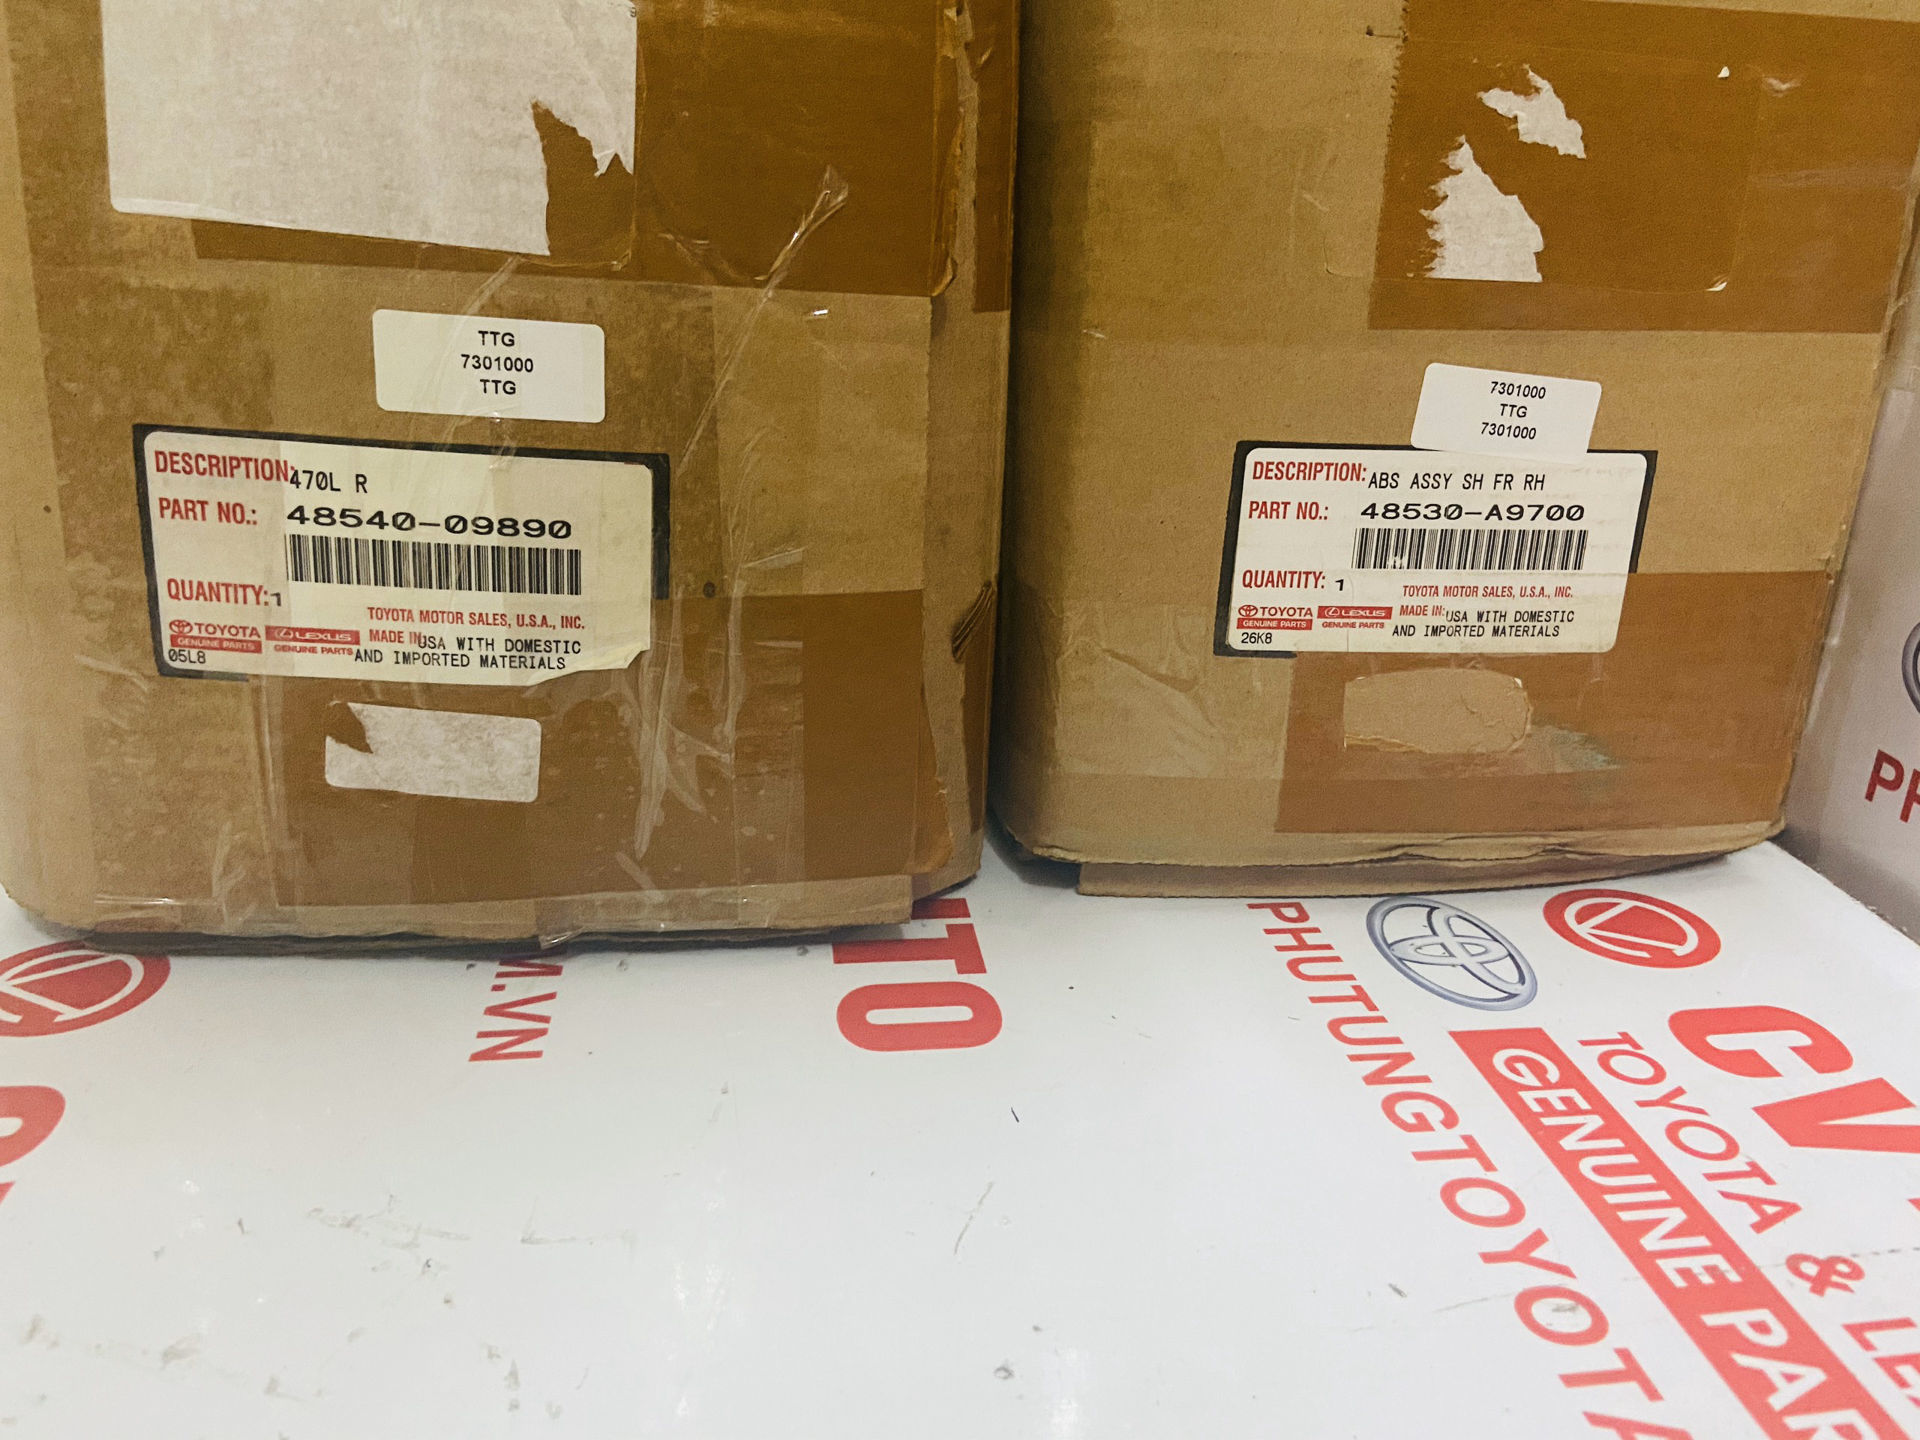 Picture of 48540-09890 48530-A9700 Giảm xóc sau Toyota Venza chính hãng